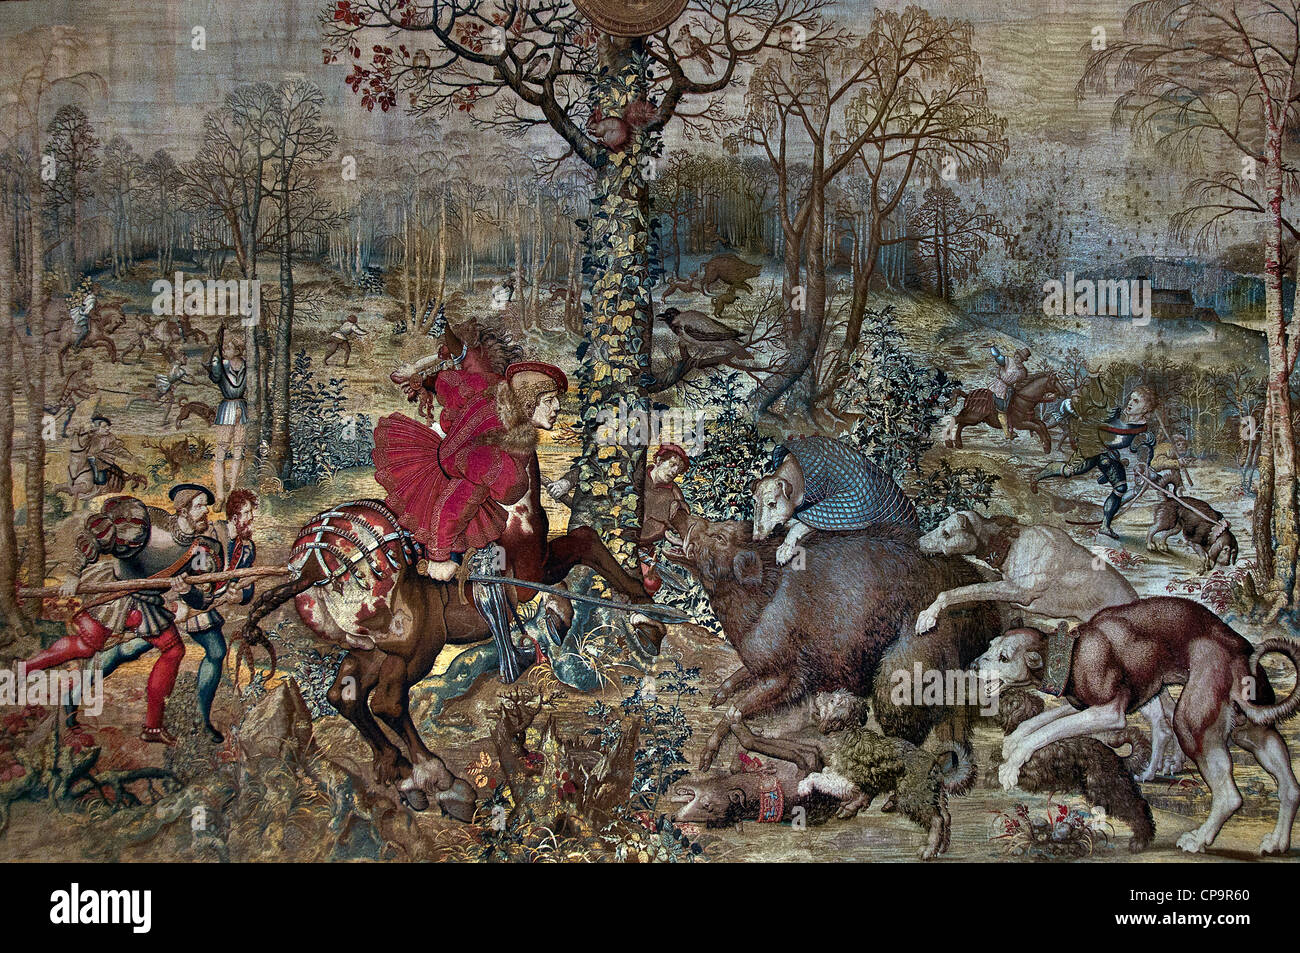 Bernard van ORLEY 1488 -1541 December tapestry The Hunts of Maximilian 1531 - 1533 Brussels Tapestry wool silk gold - Stock Image